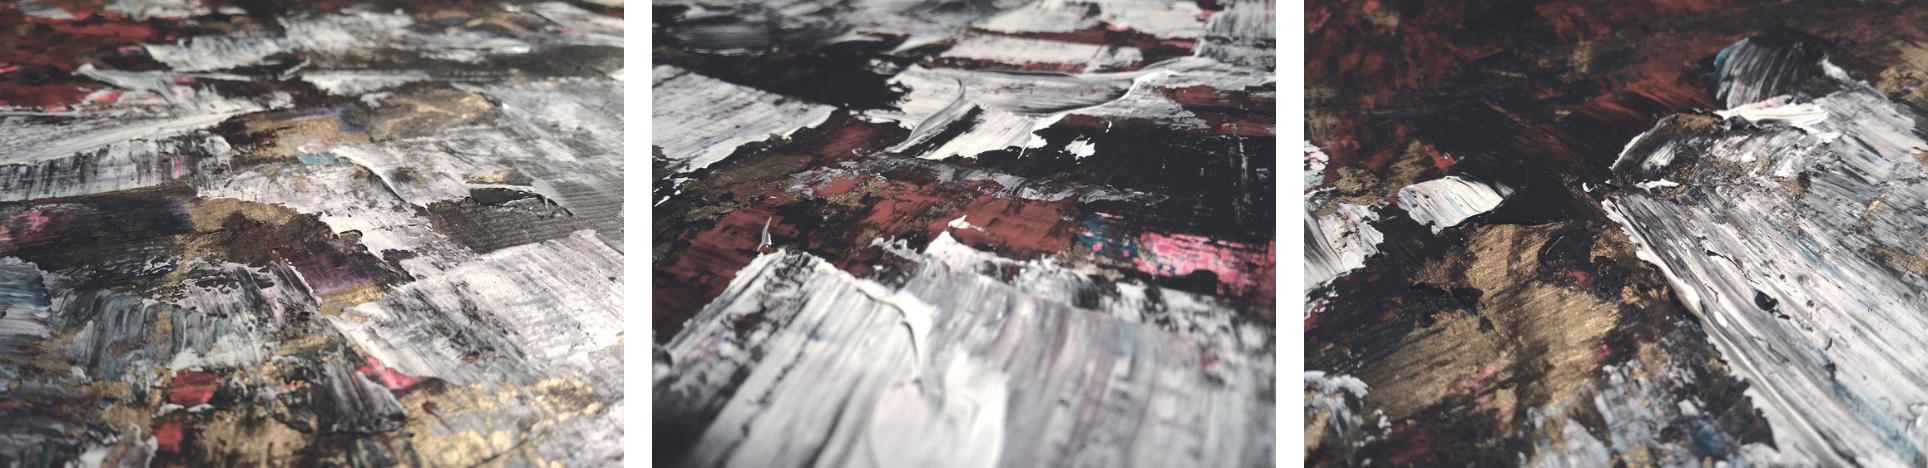 bonjourmolotov Andre Gigante Painting 01.png